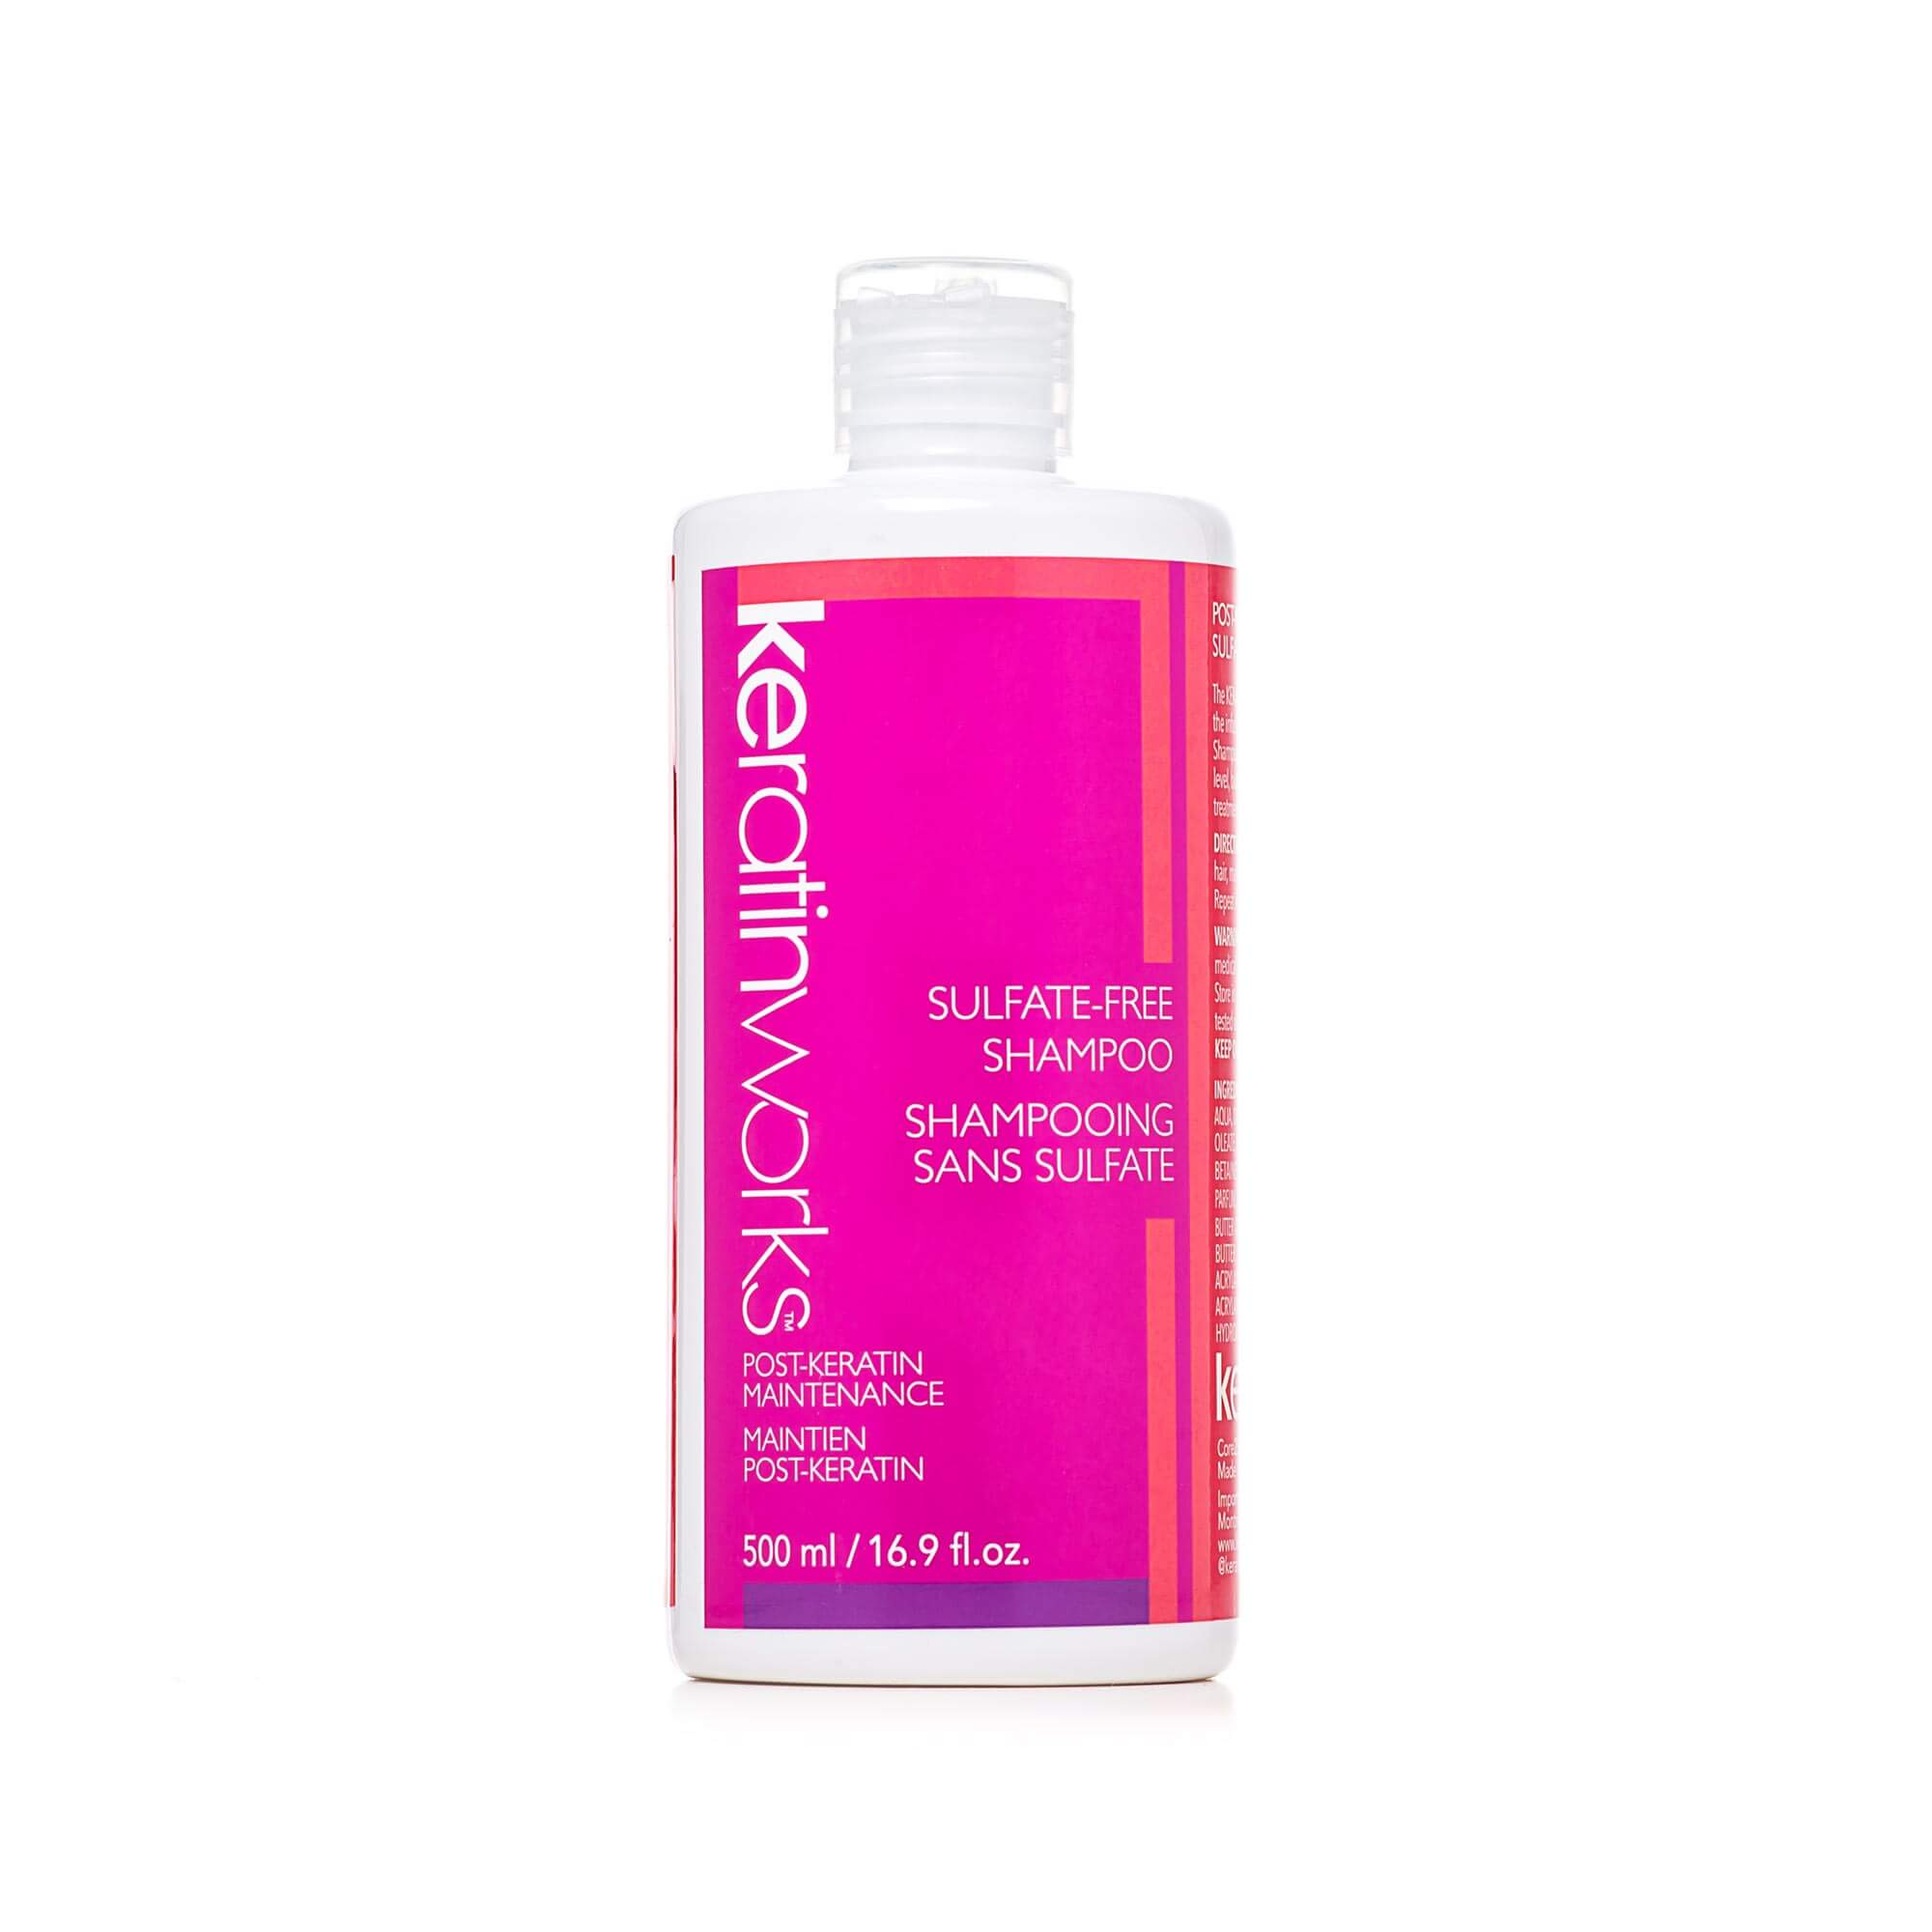 KERATINWORKS Sulfate-Free Shampoo